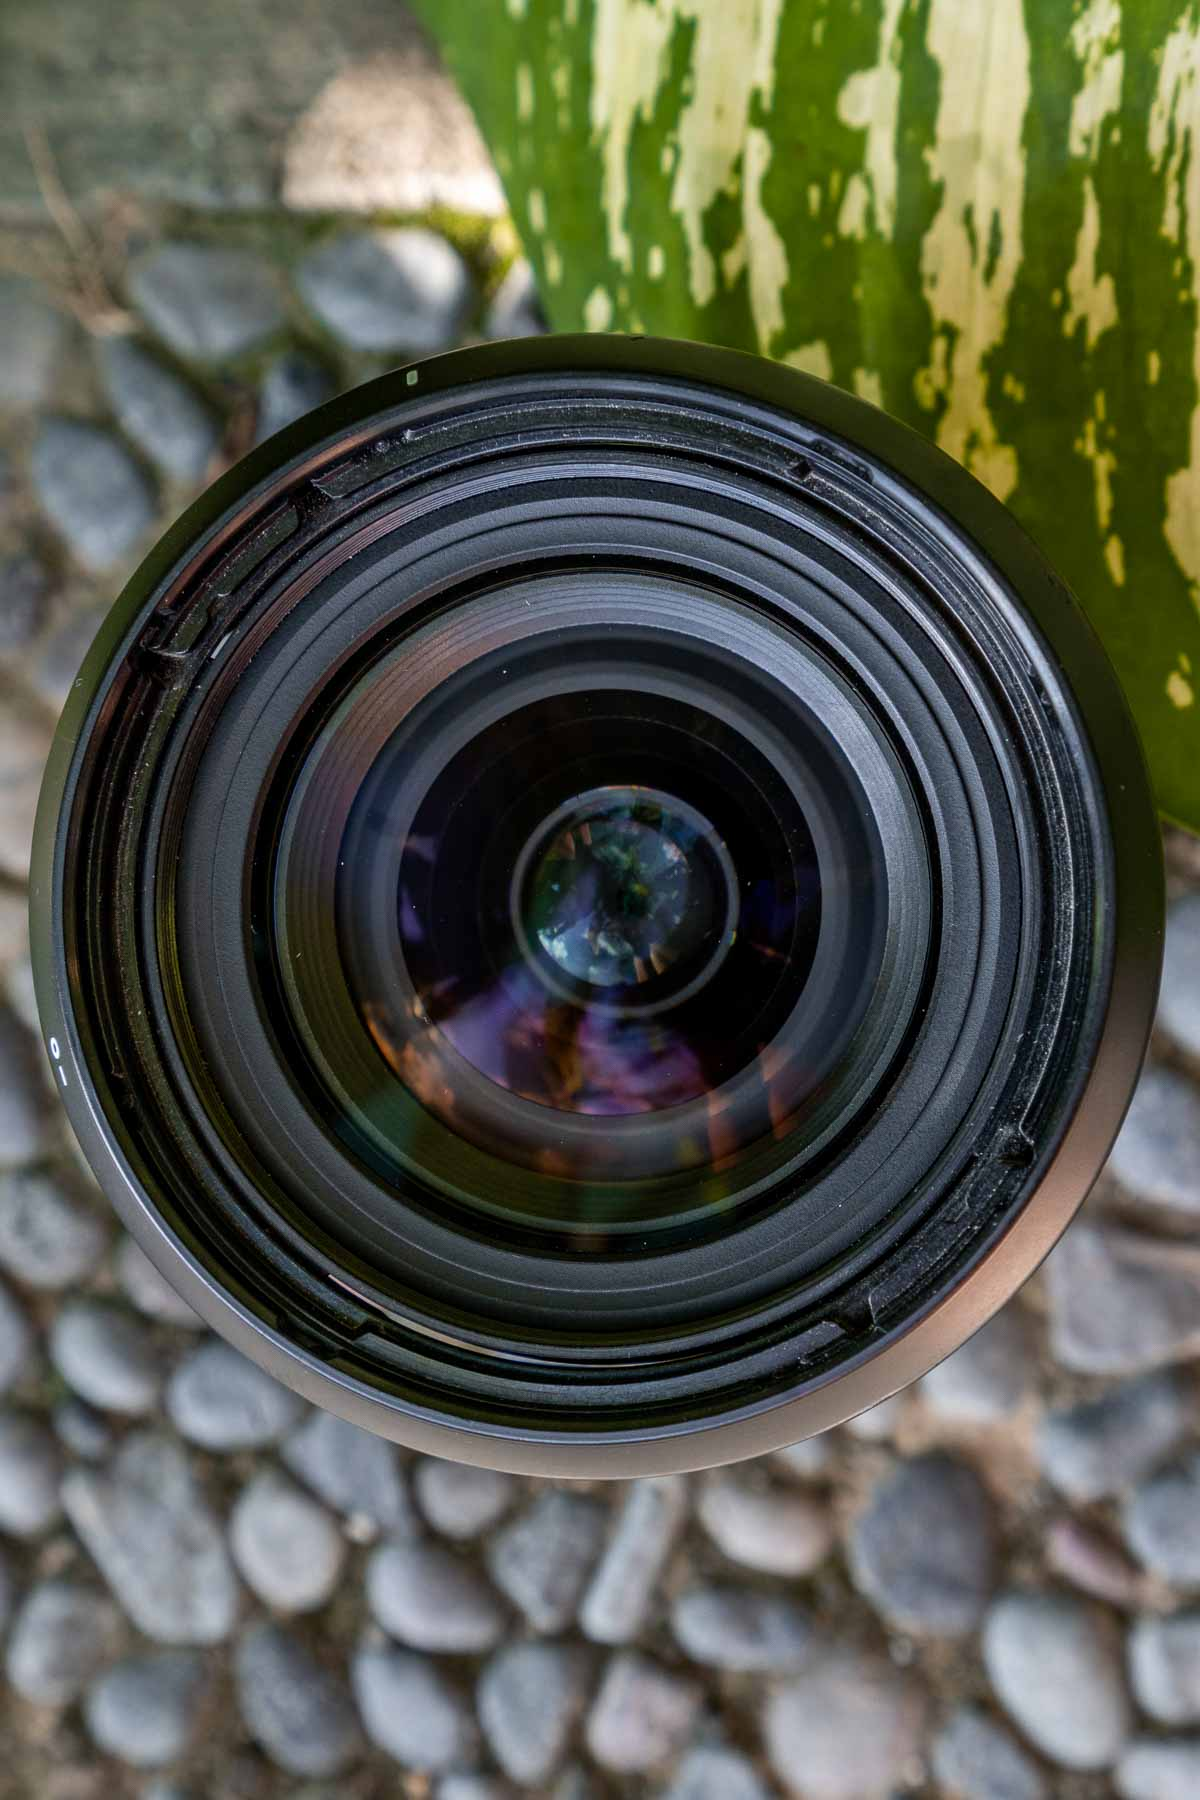 Tamron 28-75mm f2.8 zoom lens